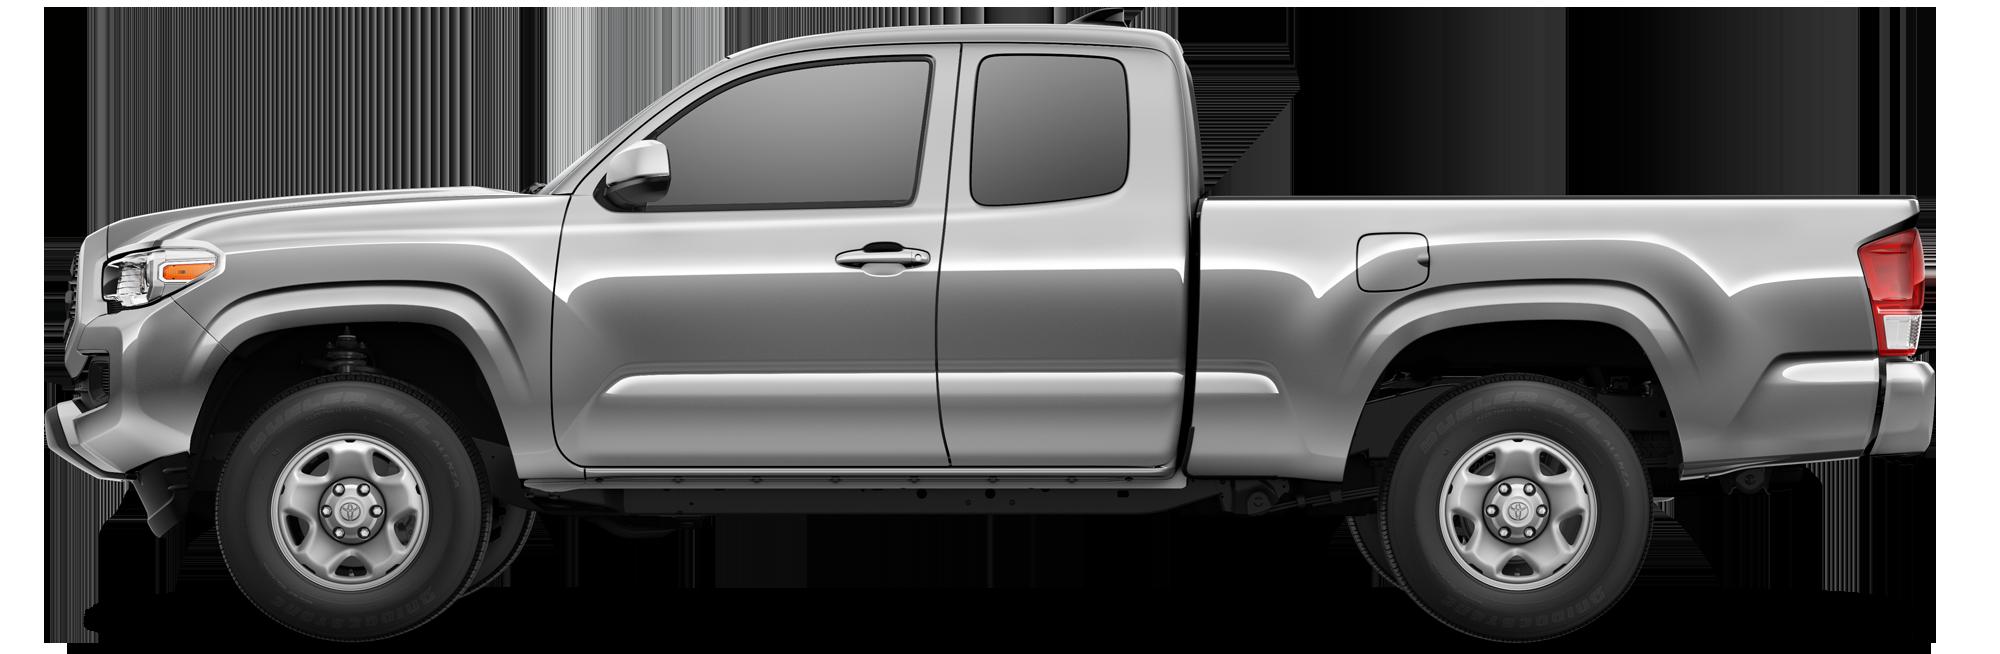 2019 Toyota Tacoma Truck SR